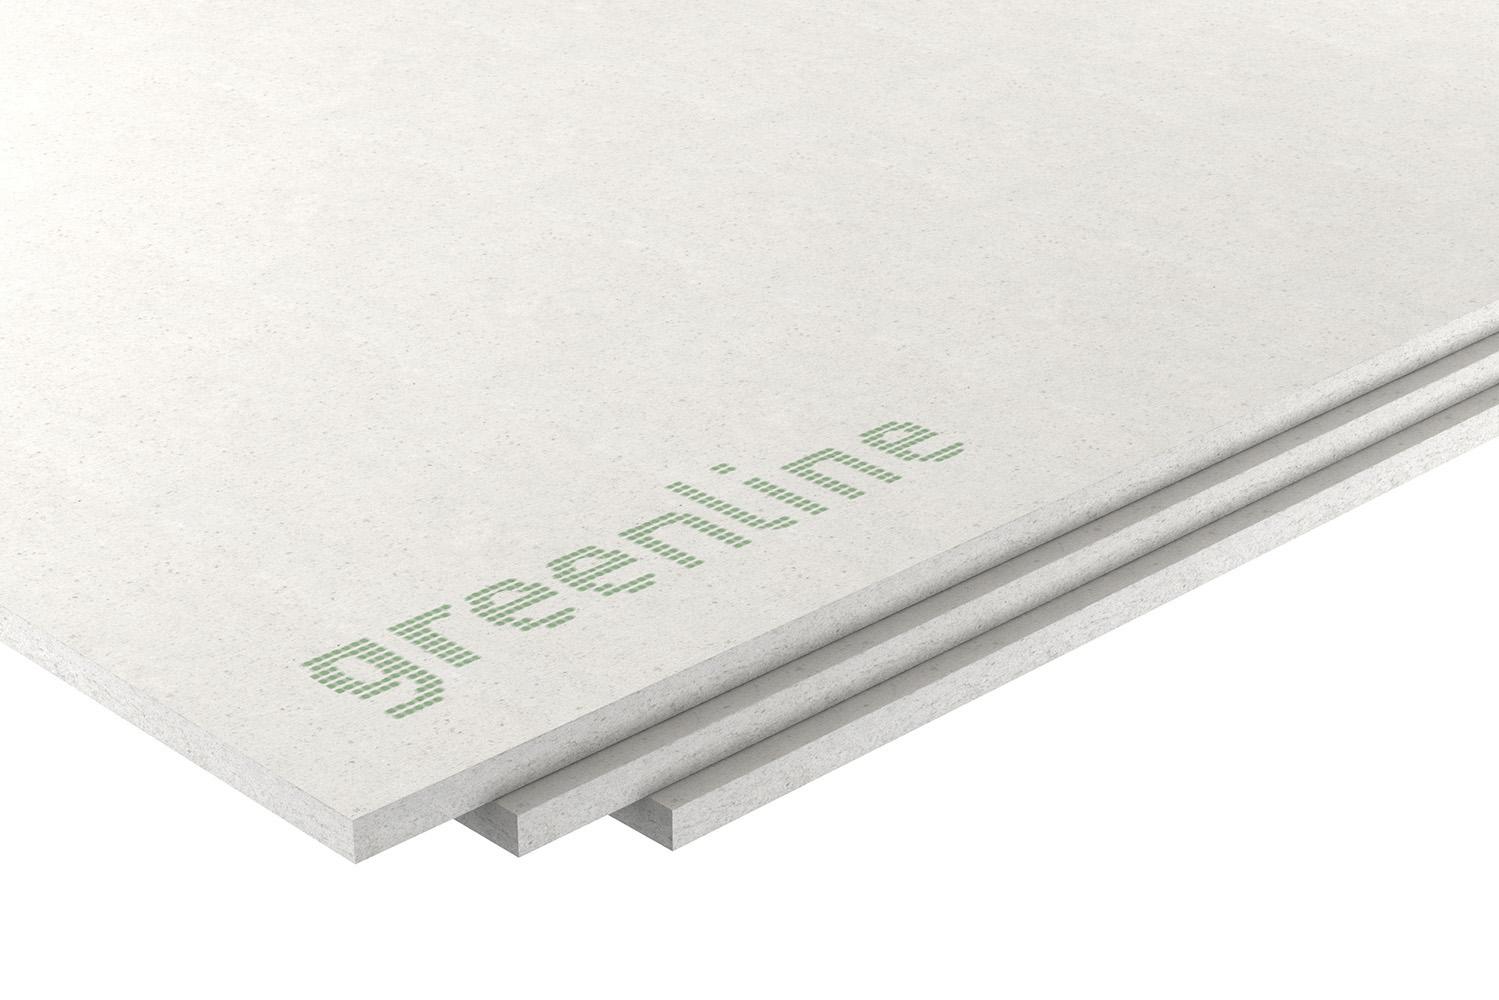 Sádrovláknitá deska Fermacell Greenline (1500x1000x10) mm